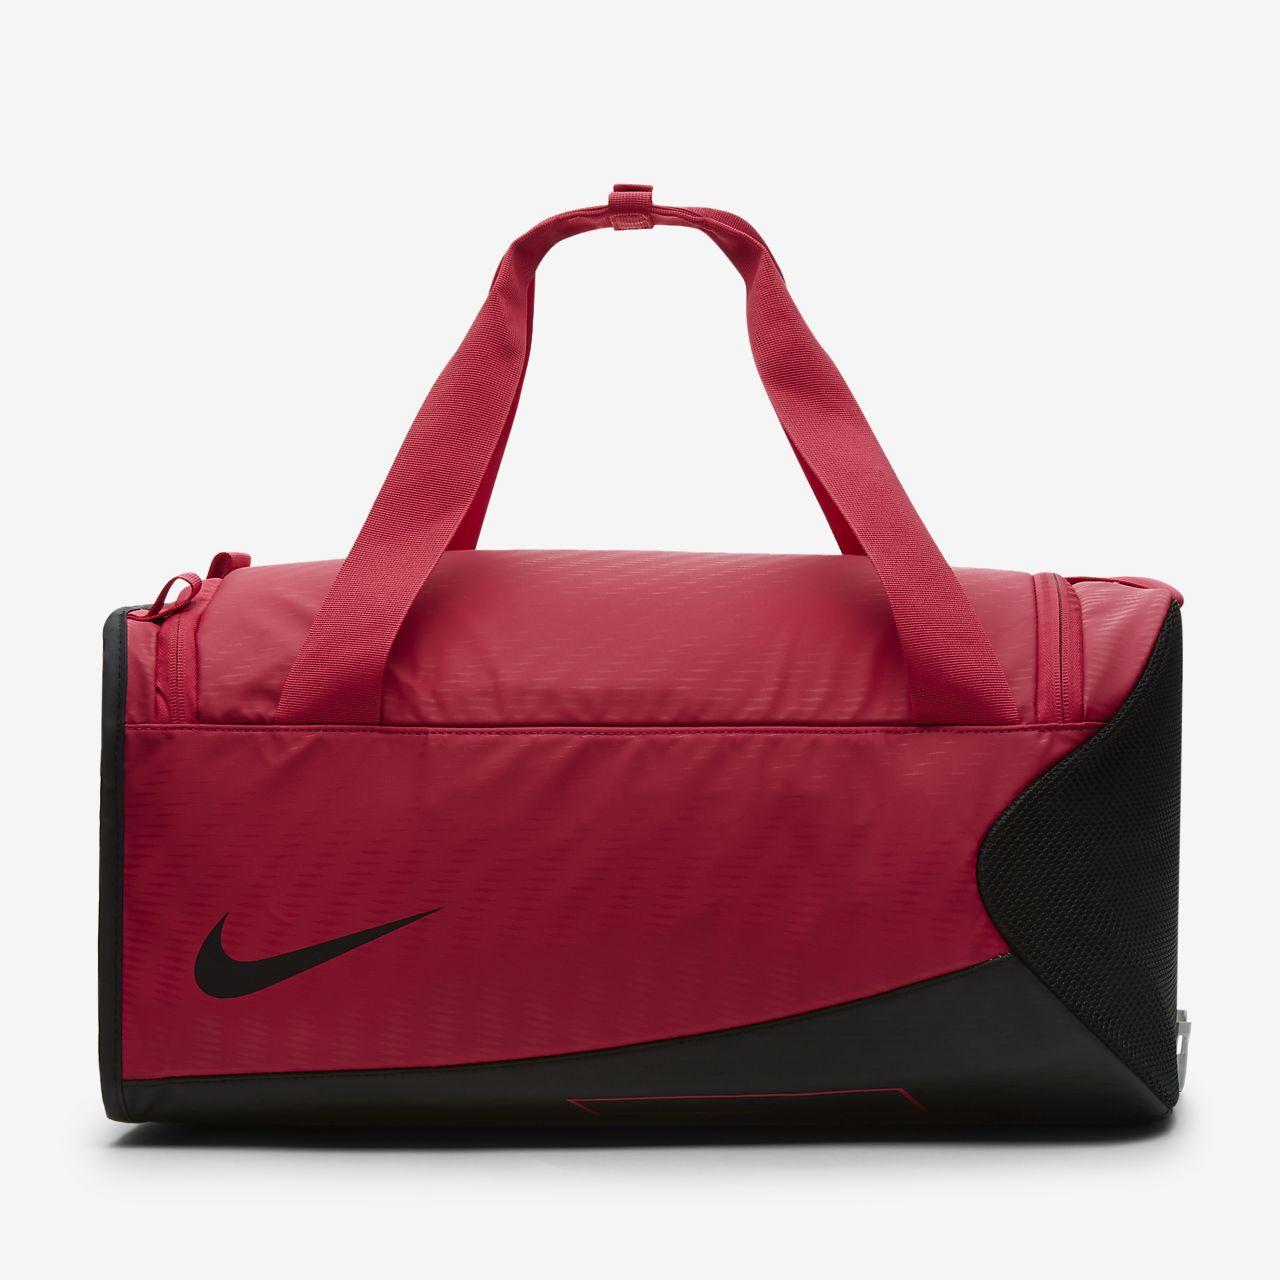 6467b32bdb Nike Alpha Adapt Crossbody Big Kids  Duffel Bag. Nike.com